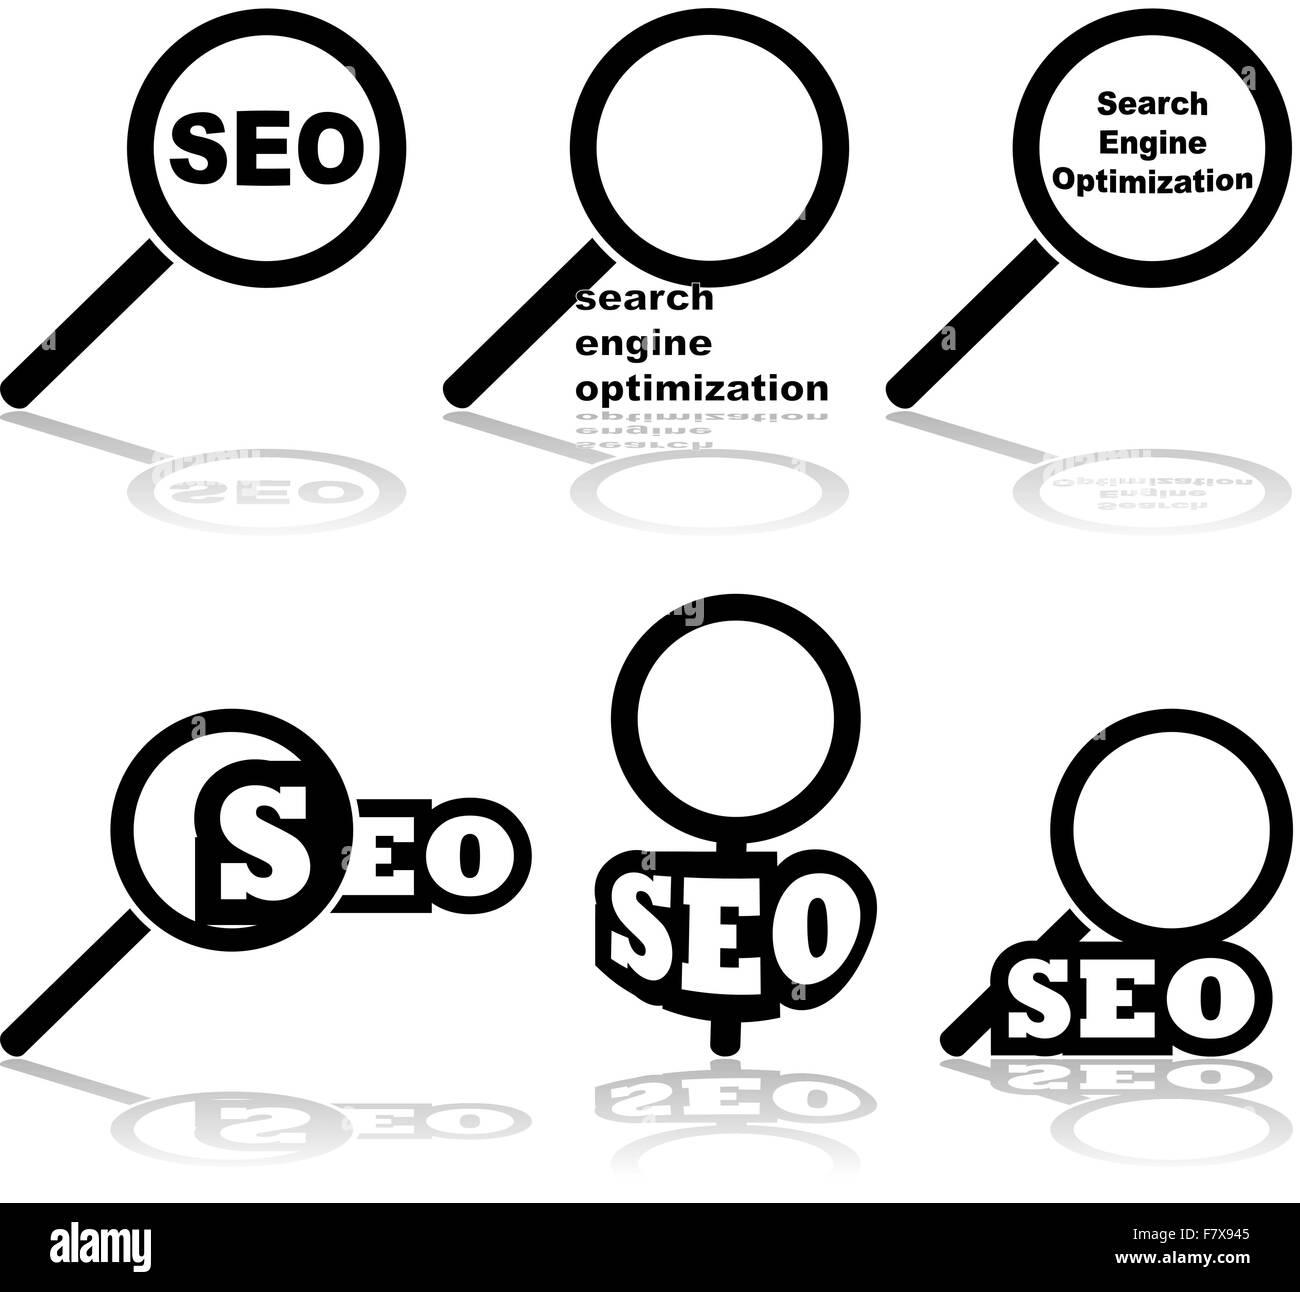 Search engine optimization - Stock Image